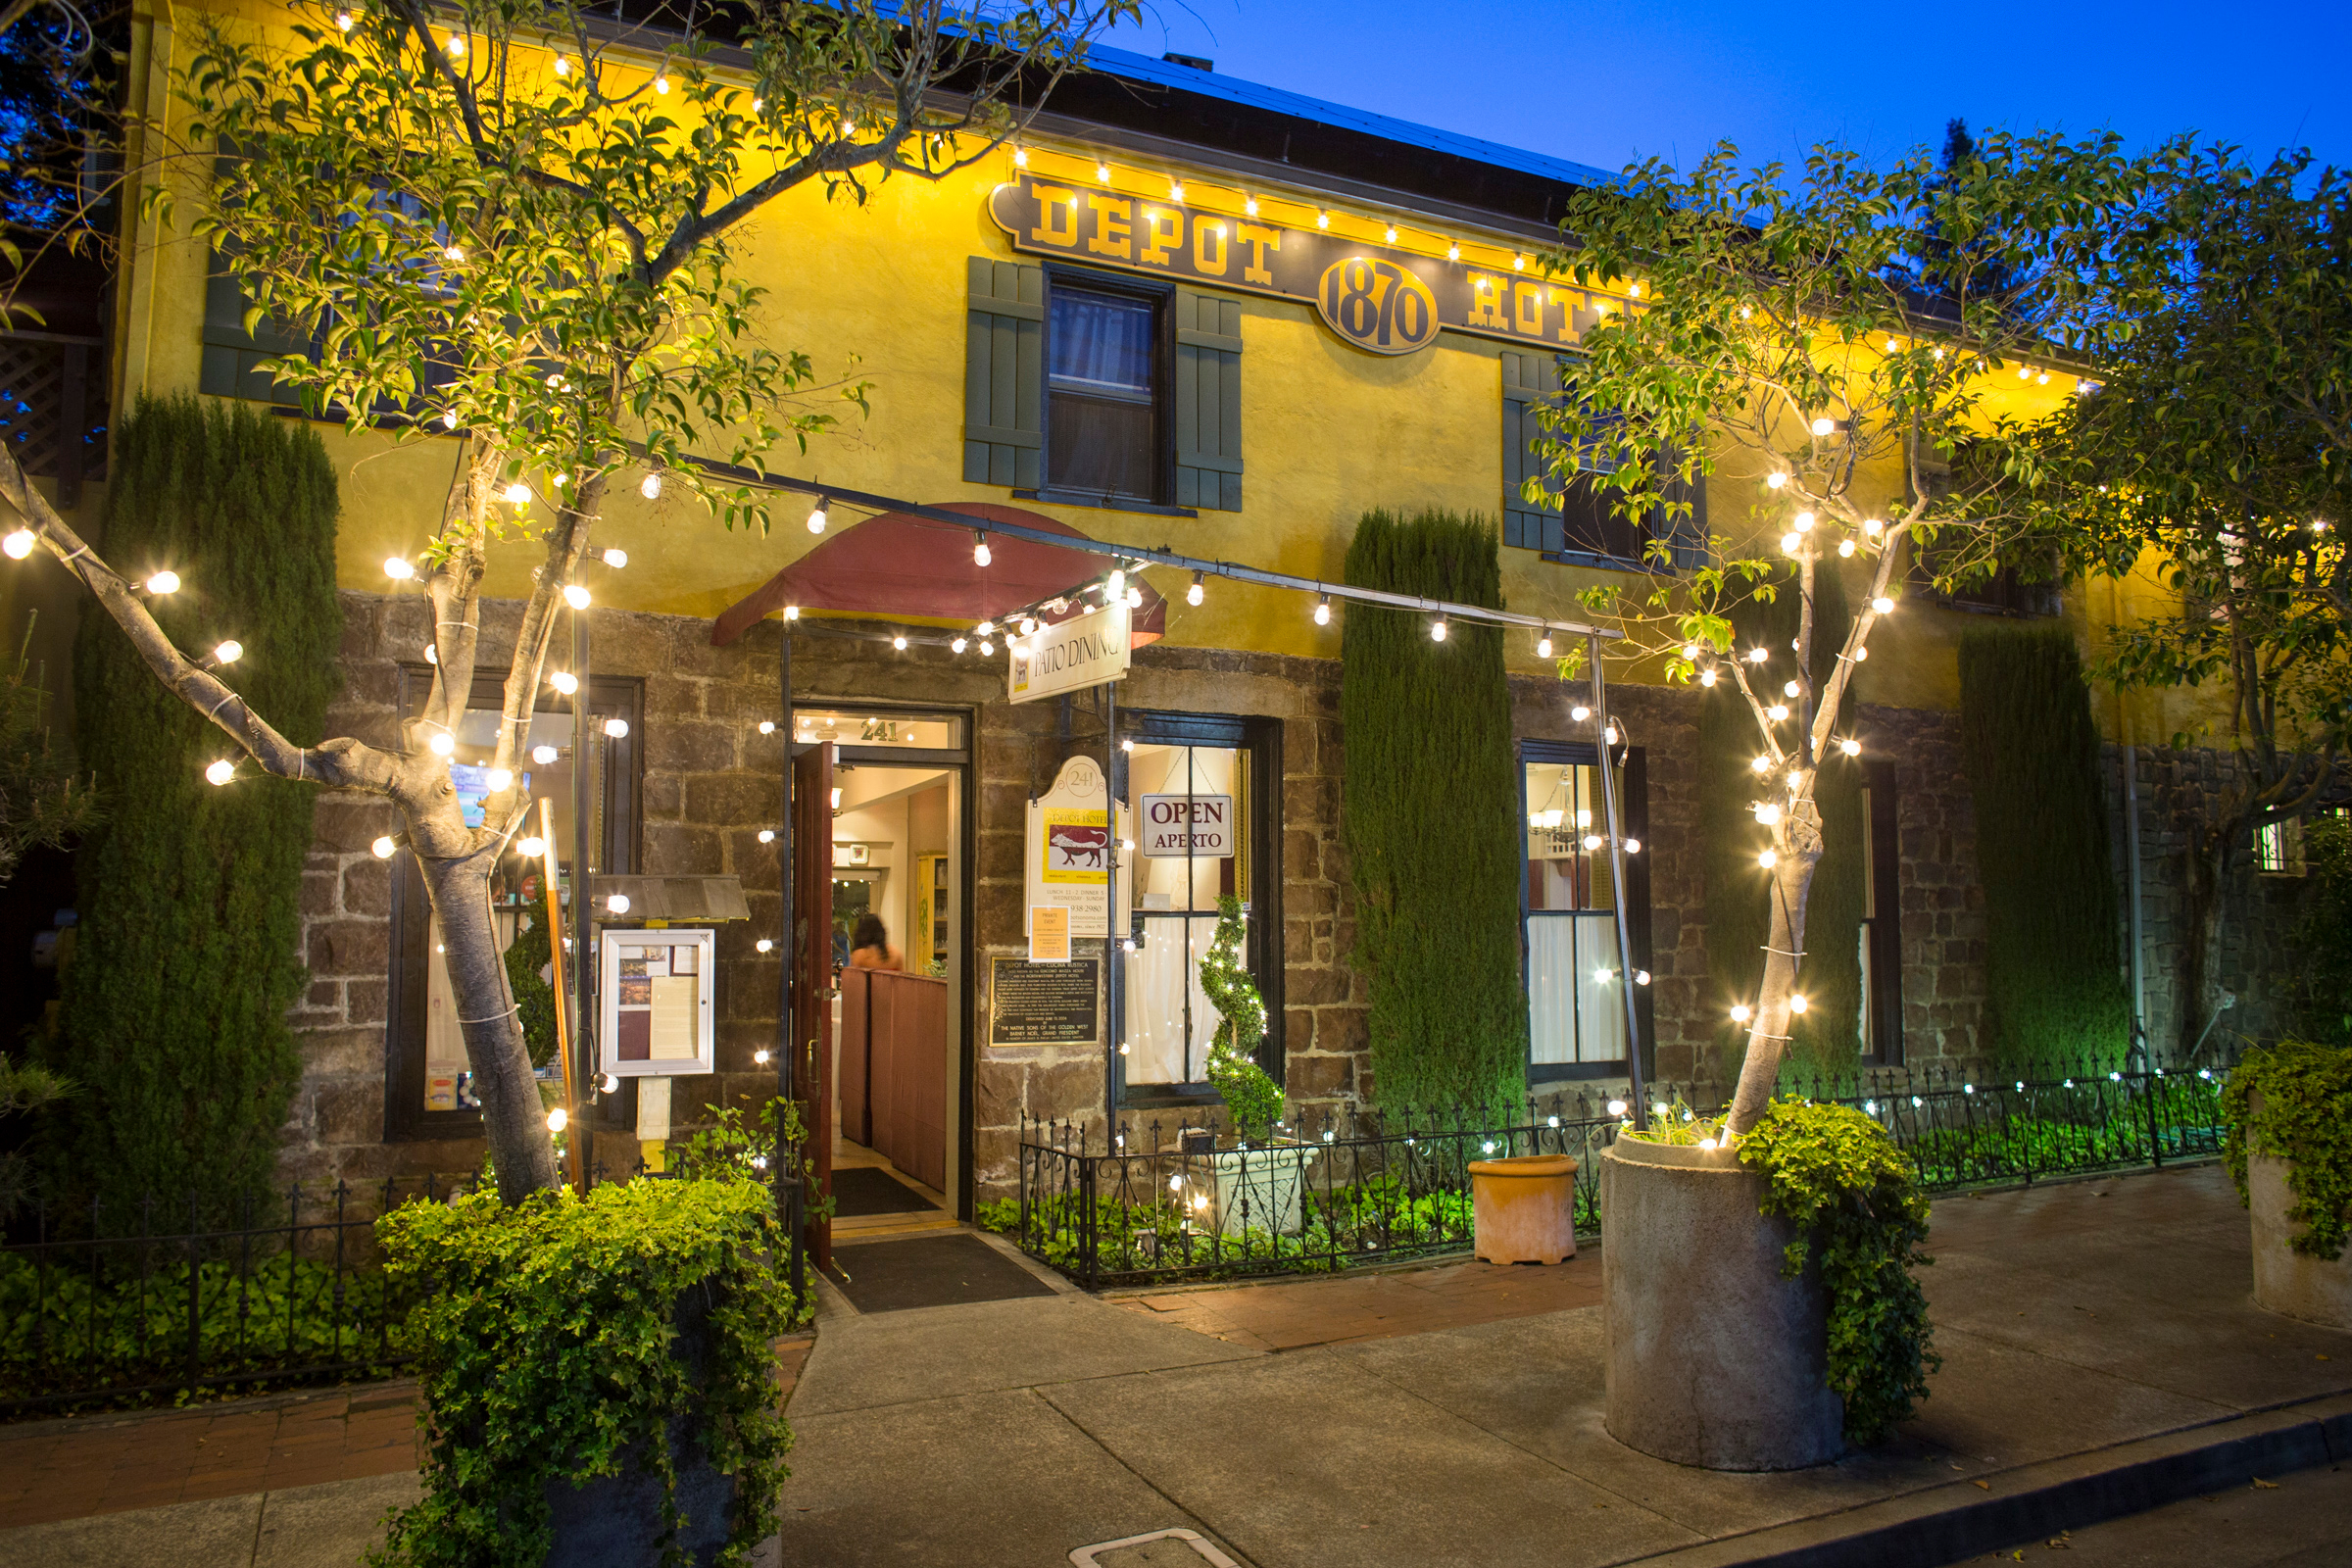 The Depot Hotel Restaurant Sonoma Sonoma Ca